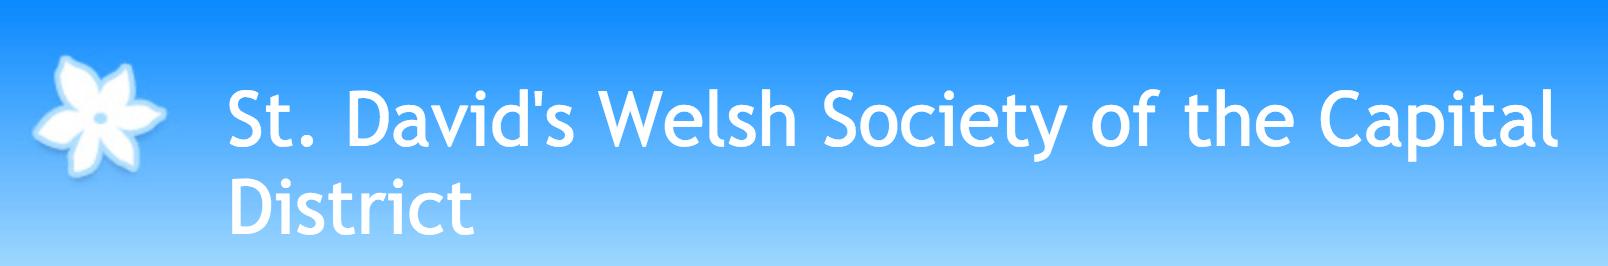 St. David's Welsh Society of the Capital District (Albany NY)